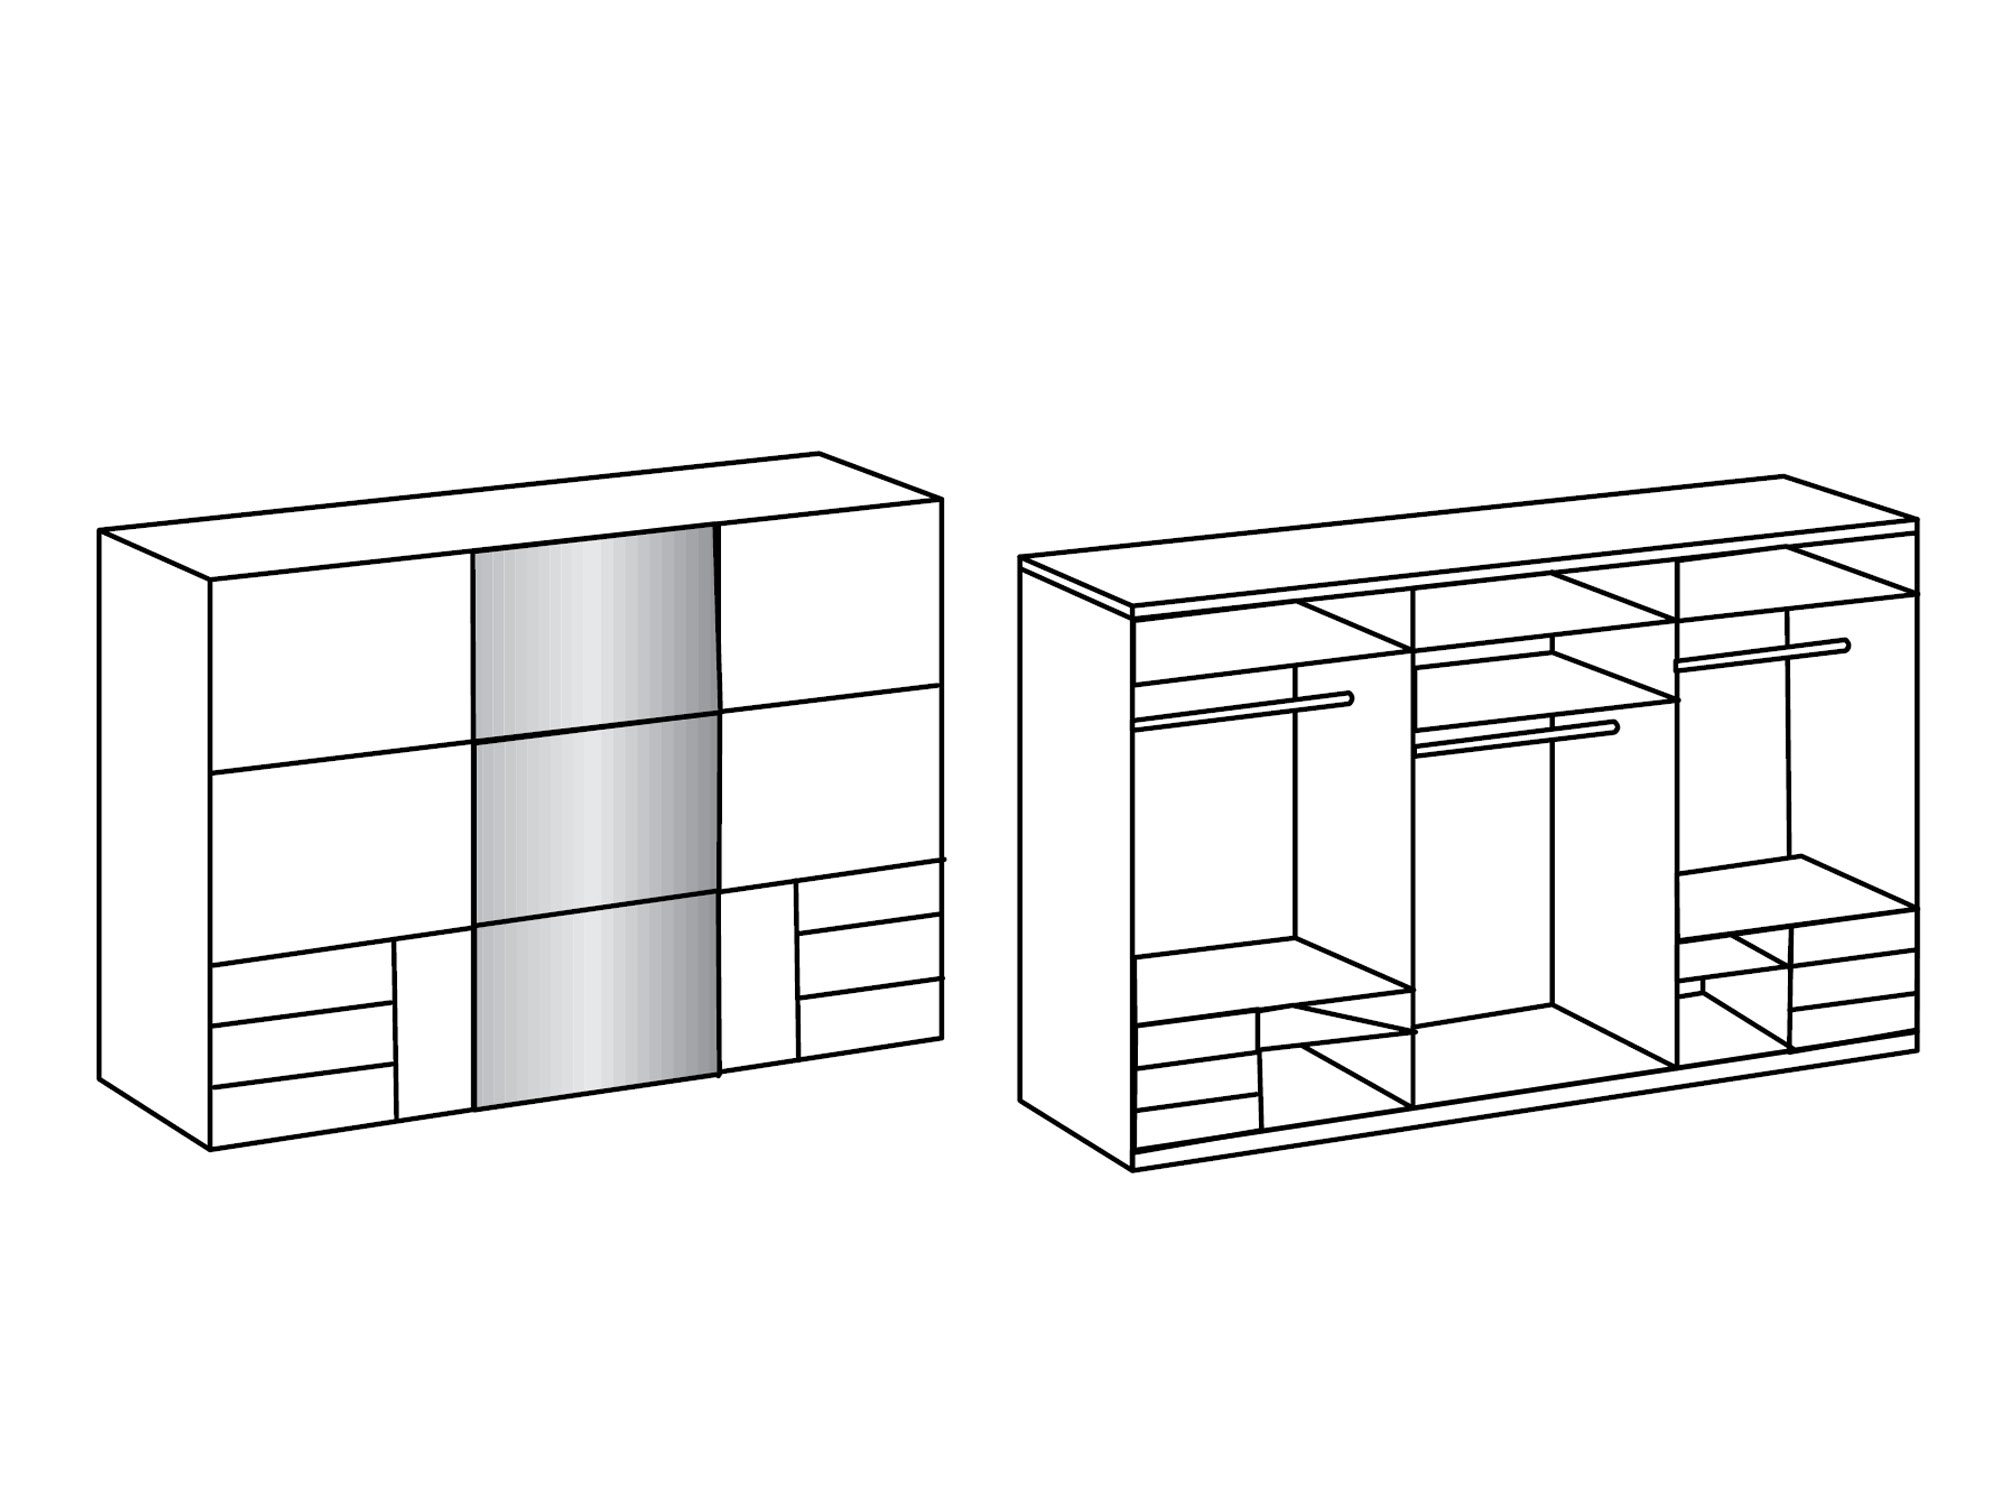 lakota schwebet renschrank lavagrau plankeneiche 300 cm 236 cm inkl spiegel. Black Bedroom Furniture Sets. Home Design Ideas